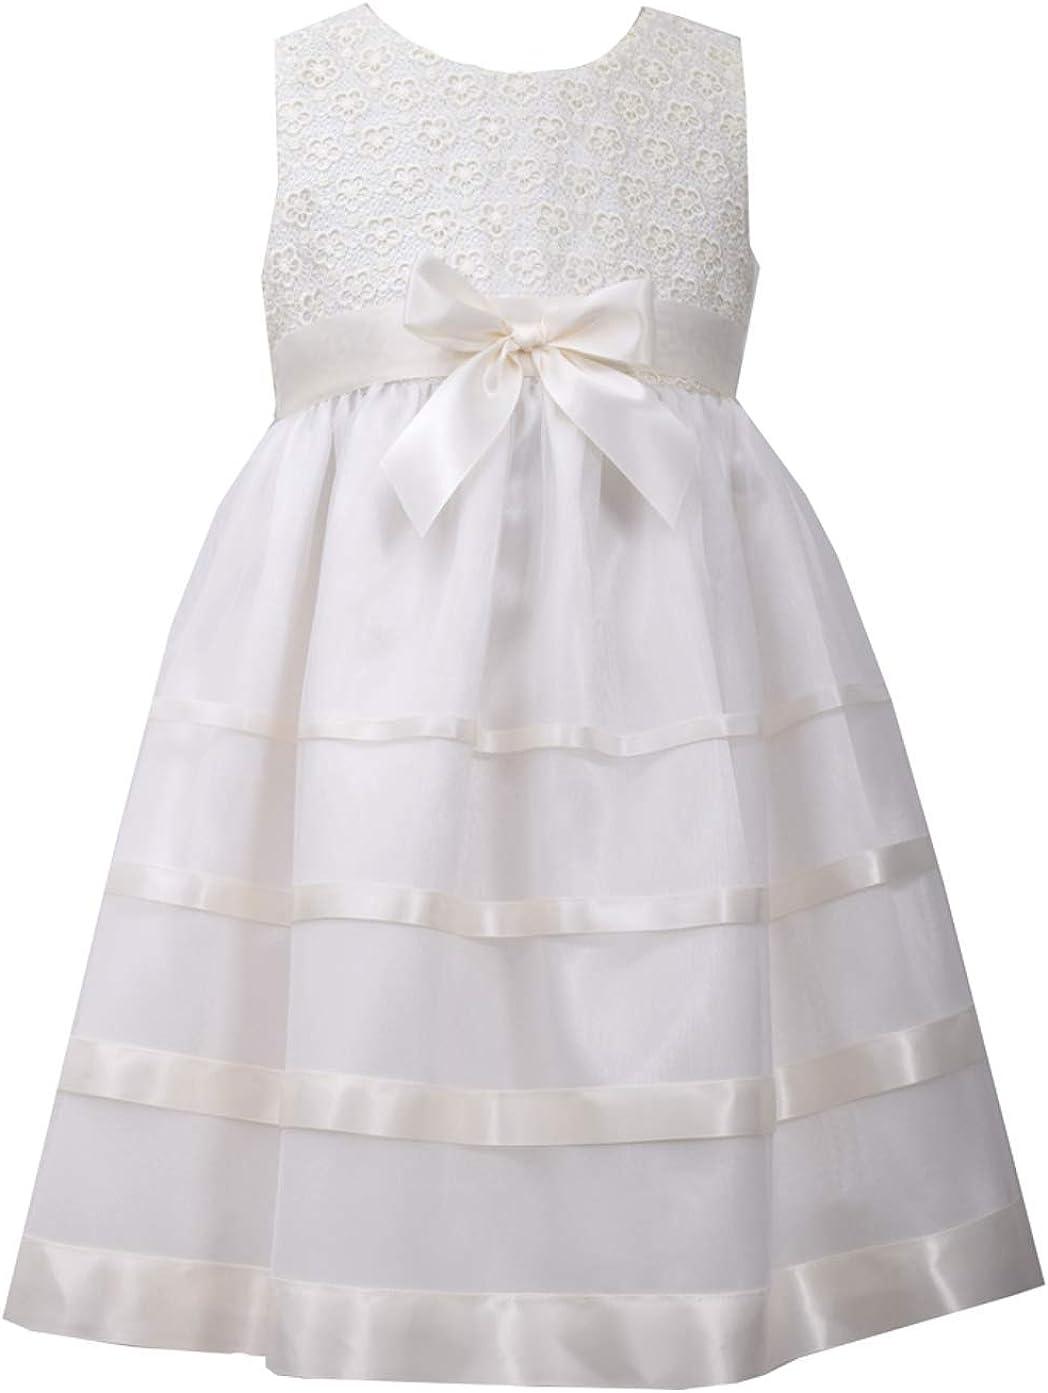 Bonnie Jean Little Girls 2T-6X